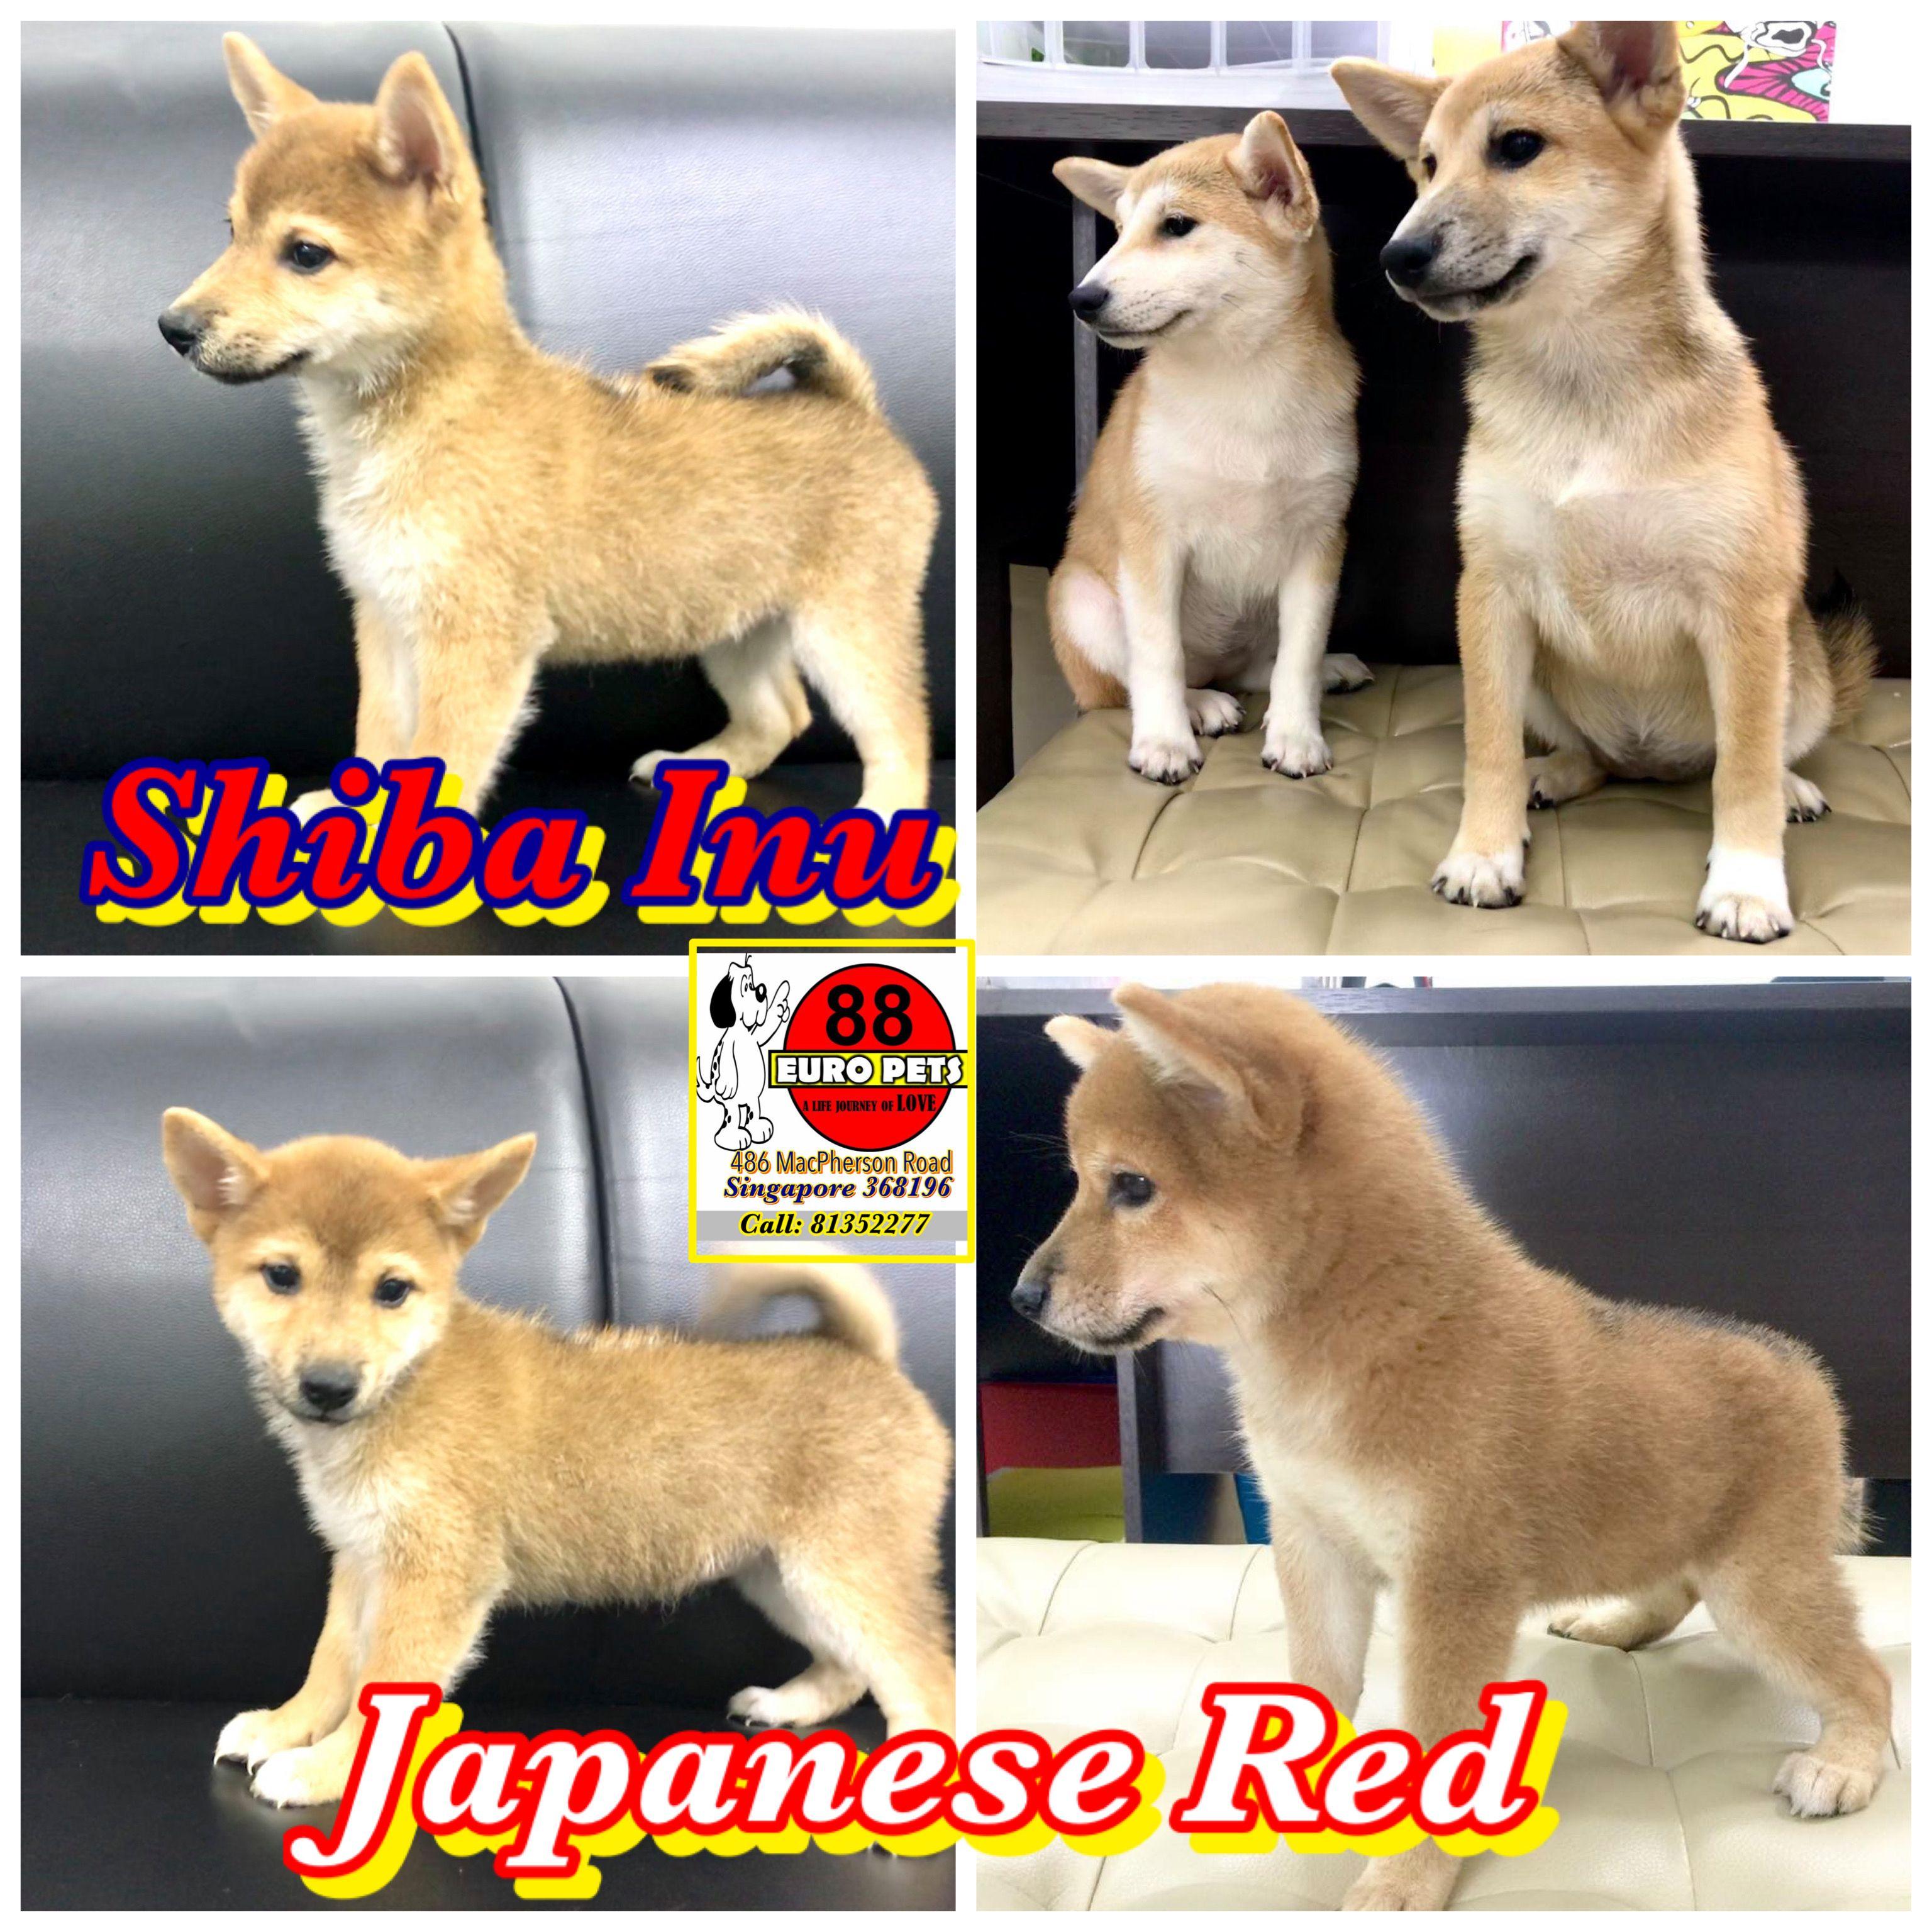 Shiba Inu Puppies For Sale Shiba Inu Puppy Puppies For Sale Shiba